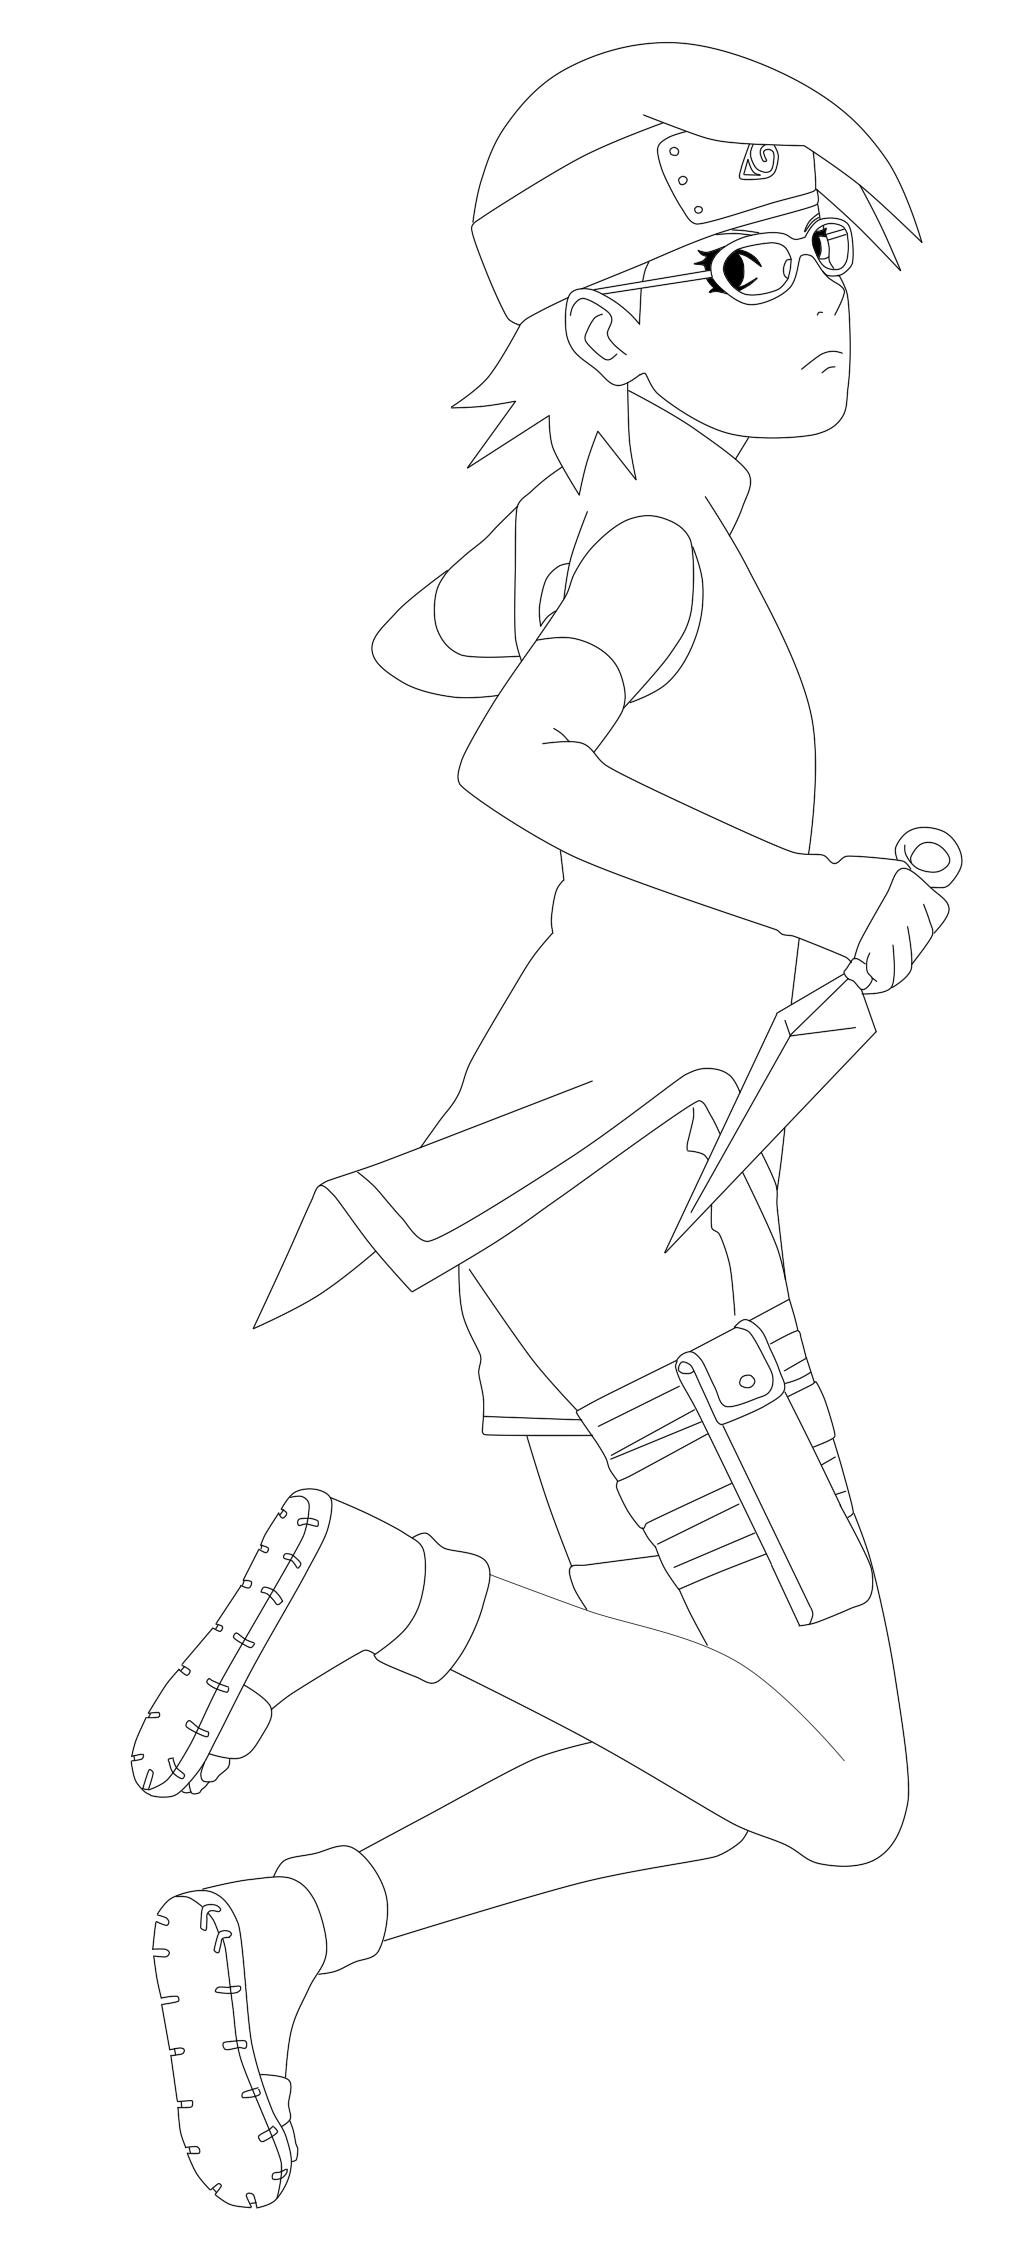 Sarada Uchiha From Boruto The Movie Lineart 539846605 likewise Himawari Uzumaki besides Kakashi Para Colorir E Imprimir Muito Facil furthermore Adult Uchiha Sasuke 185478649 also Naruto Coloring Pages Printable. on sasuke render